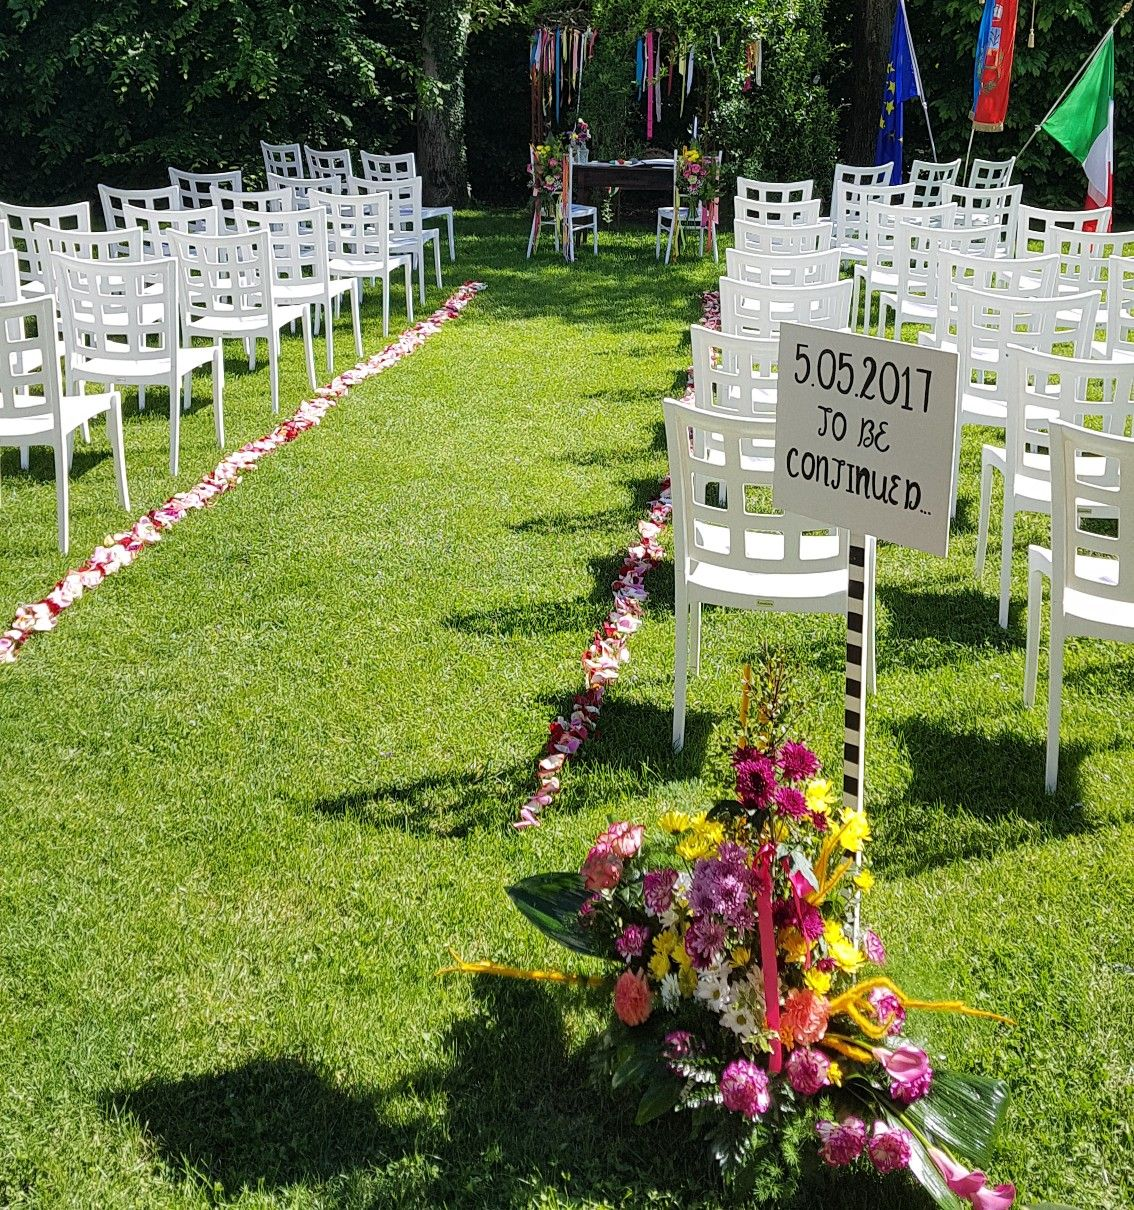 Boho wedding  Running wedding theme Rito civile all'aperto